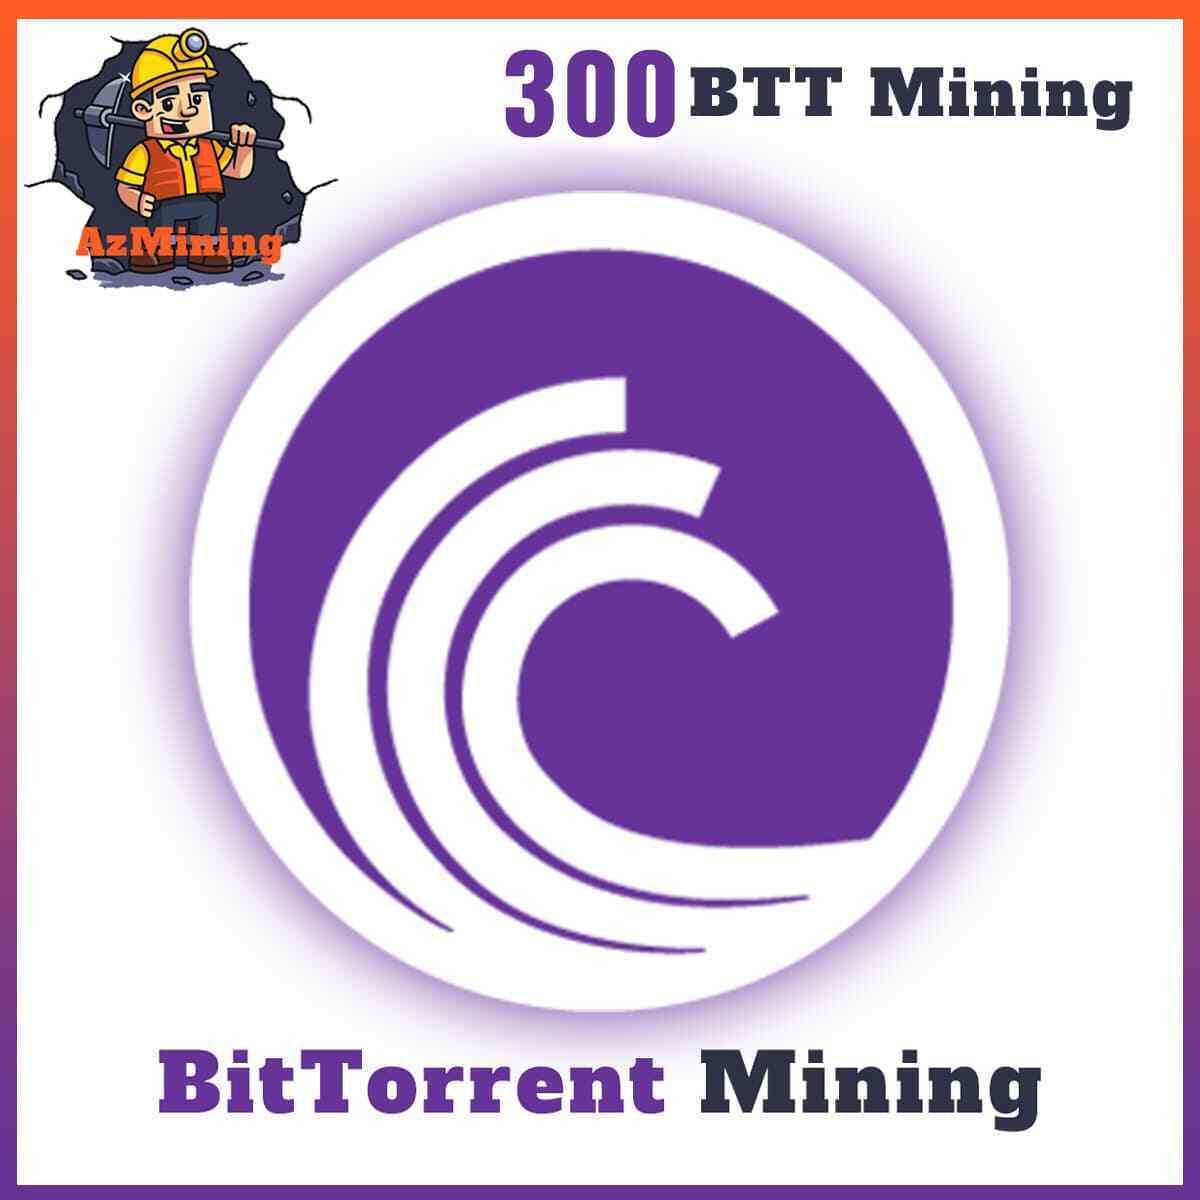 bitcoin mining bittorrent